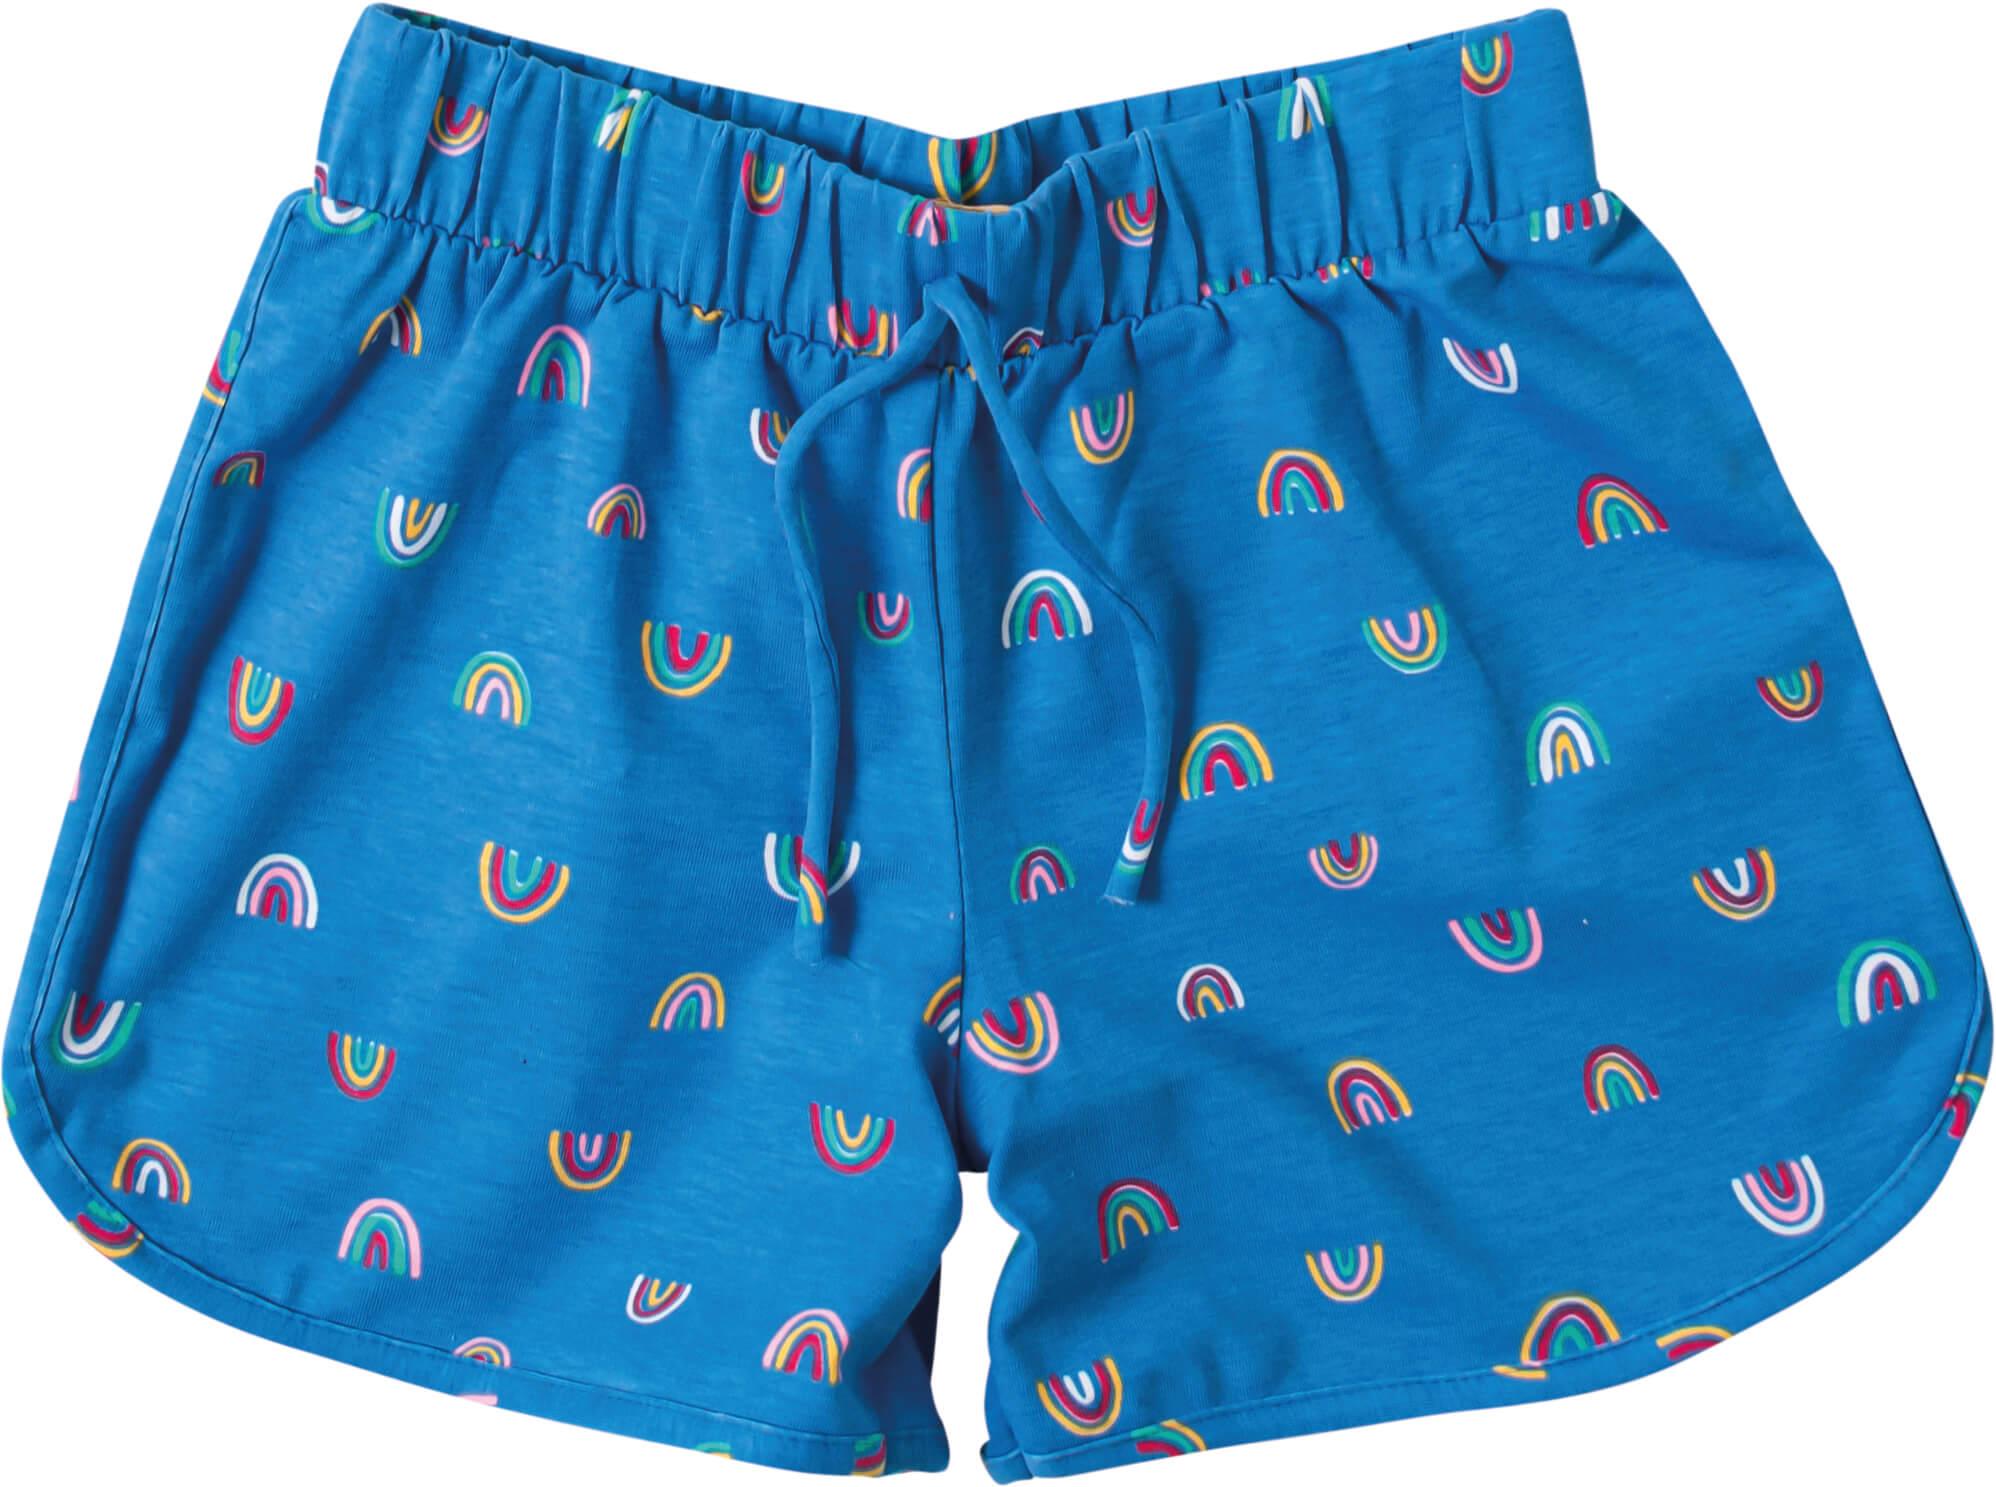 Short Infantil Feminino Azul Arco Íris - Malwee